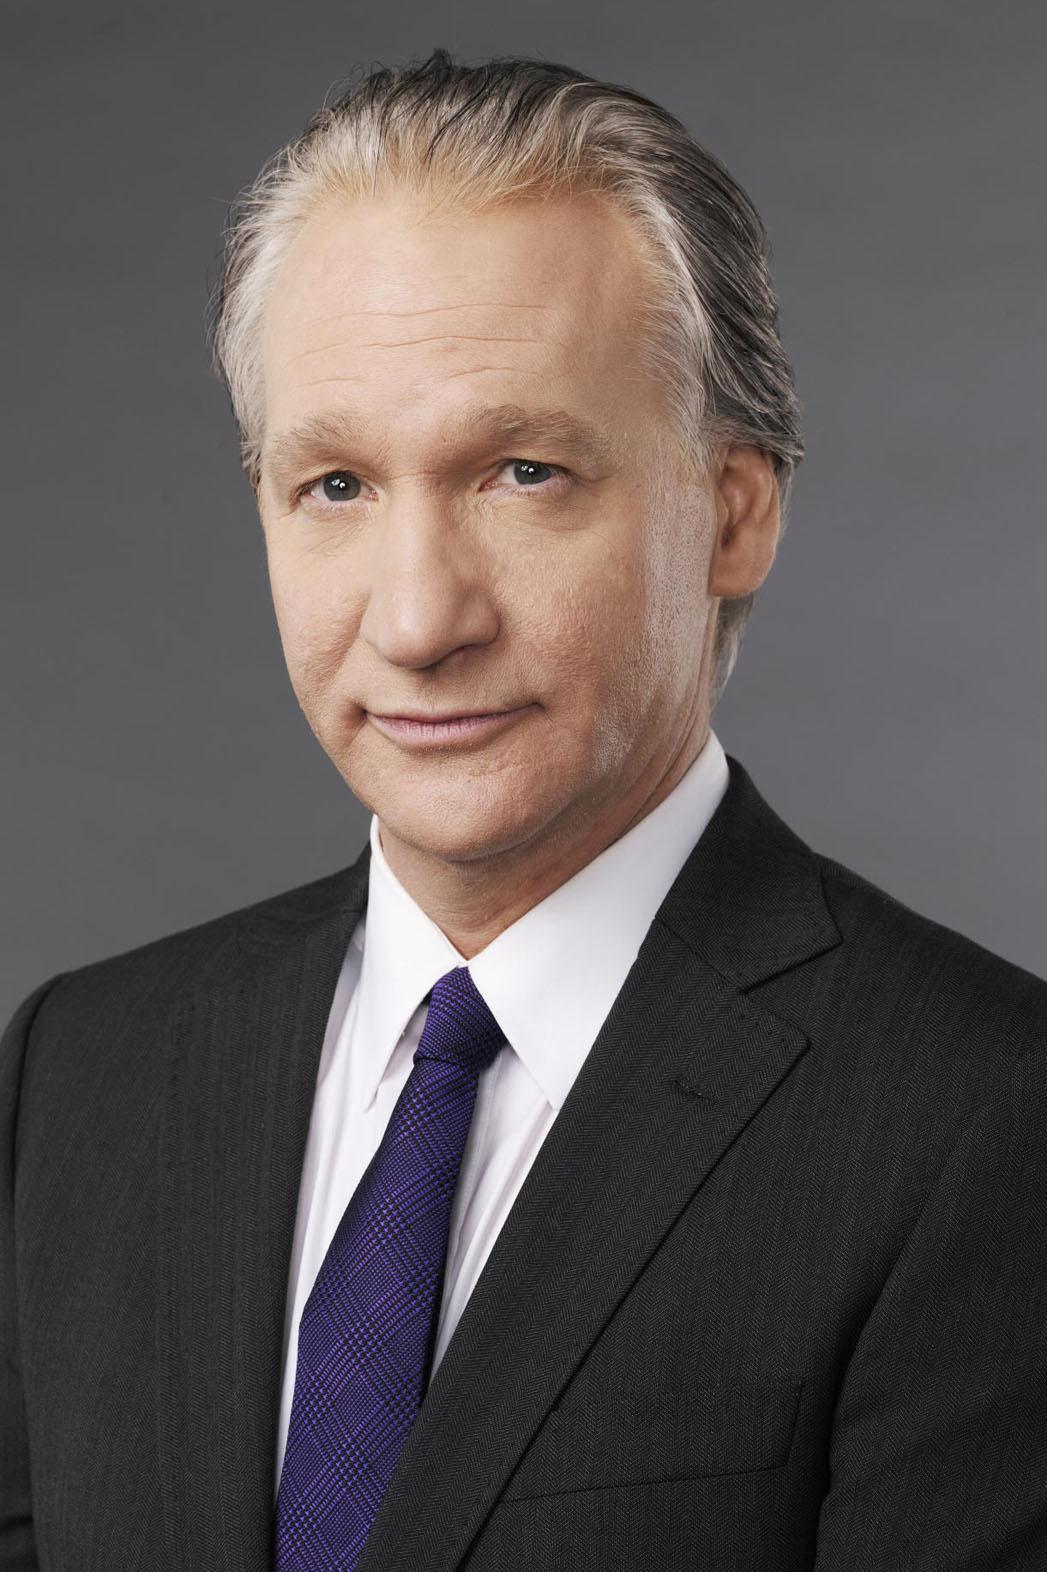 Bill Maher Portrait - P 2014